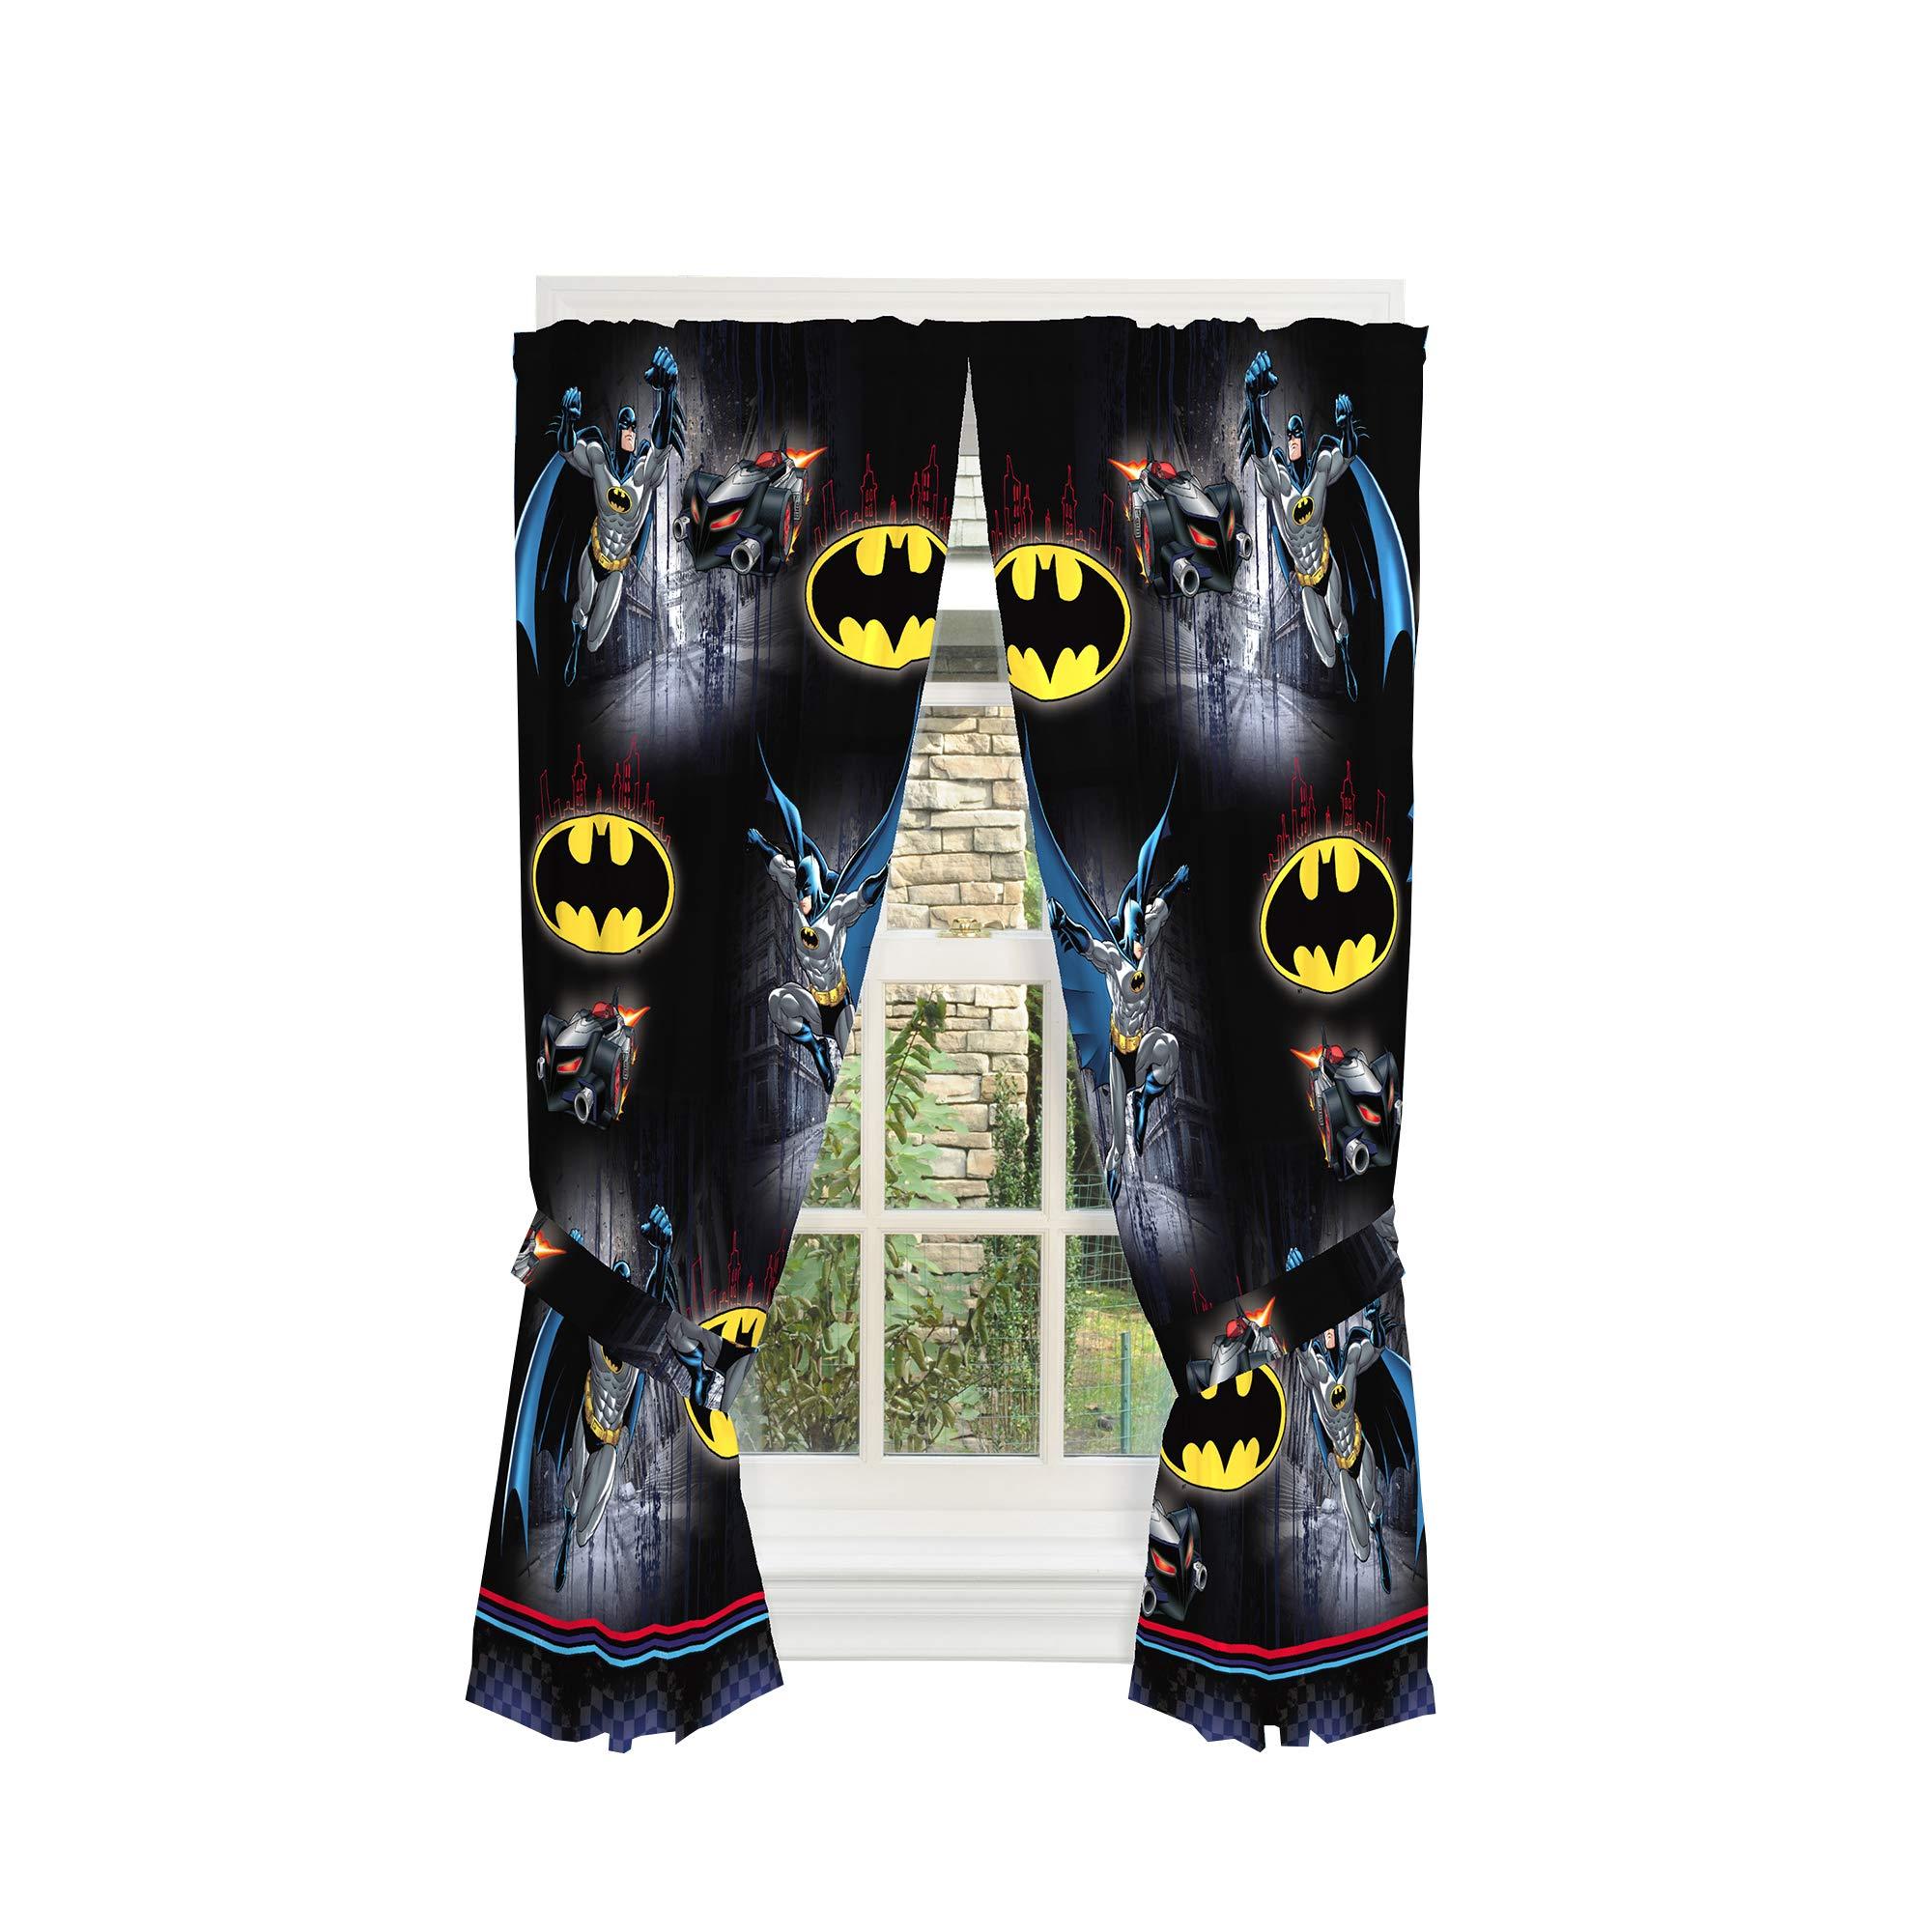 Franco Kids Room Window Curtain Panels with Tie Backs, 82'' x 63'', Batman by Franco